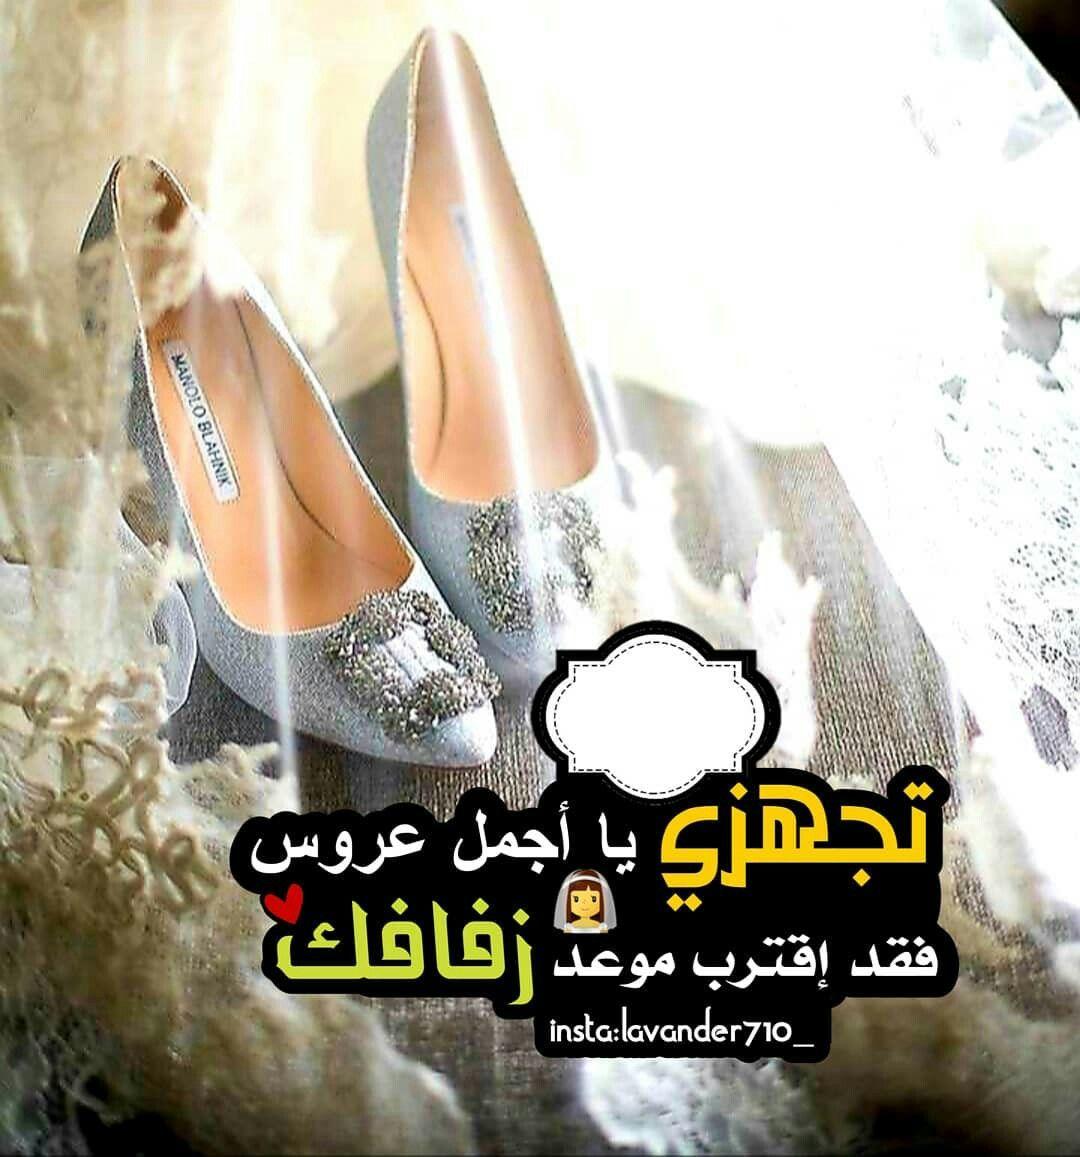 Pin By Sasoo Salohy On تصاميم صور Wedding Logo Design Bridal Shower Cupcakes Wedding Gift Pack